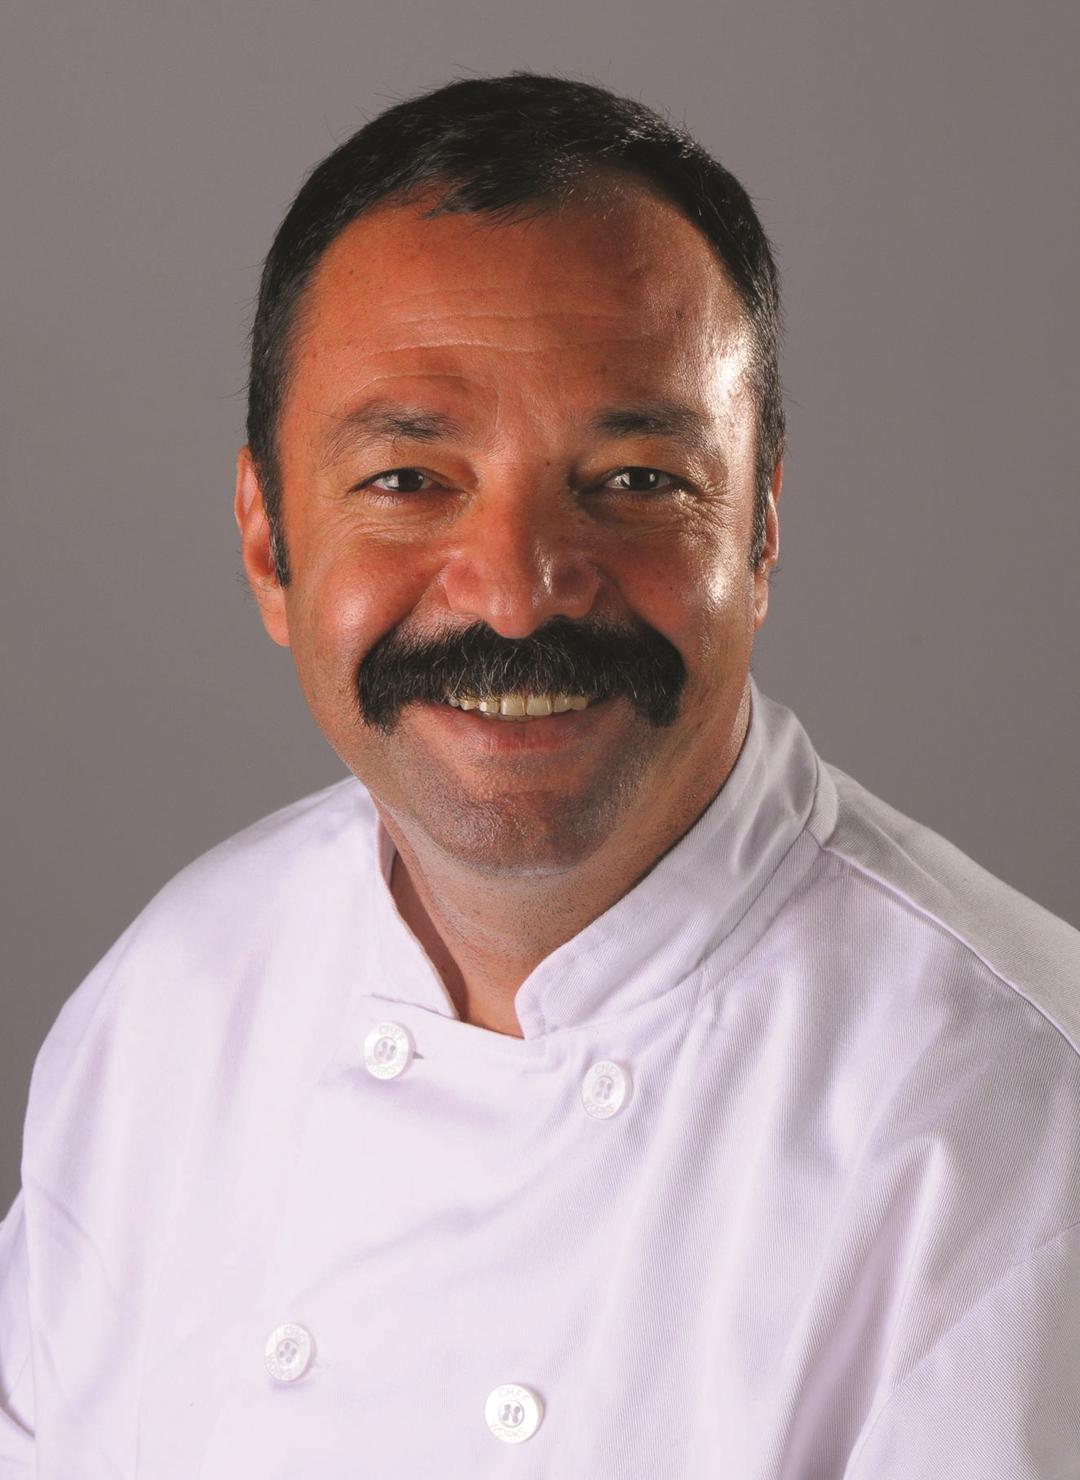 Musa Dağdeviren, author of the Turkish Cookbook